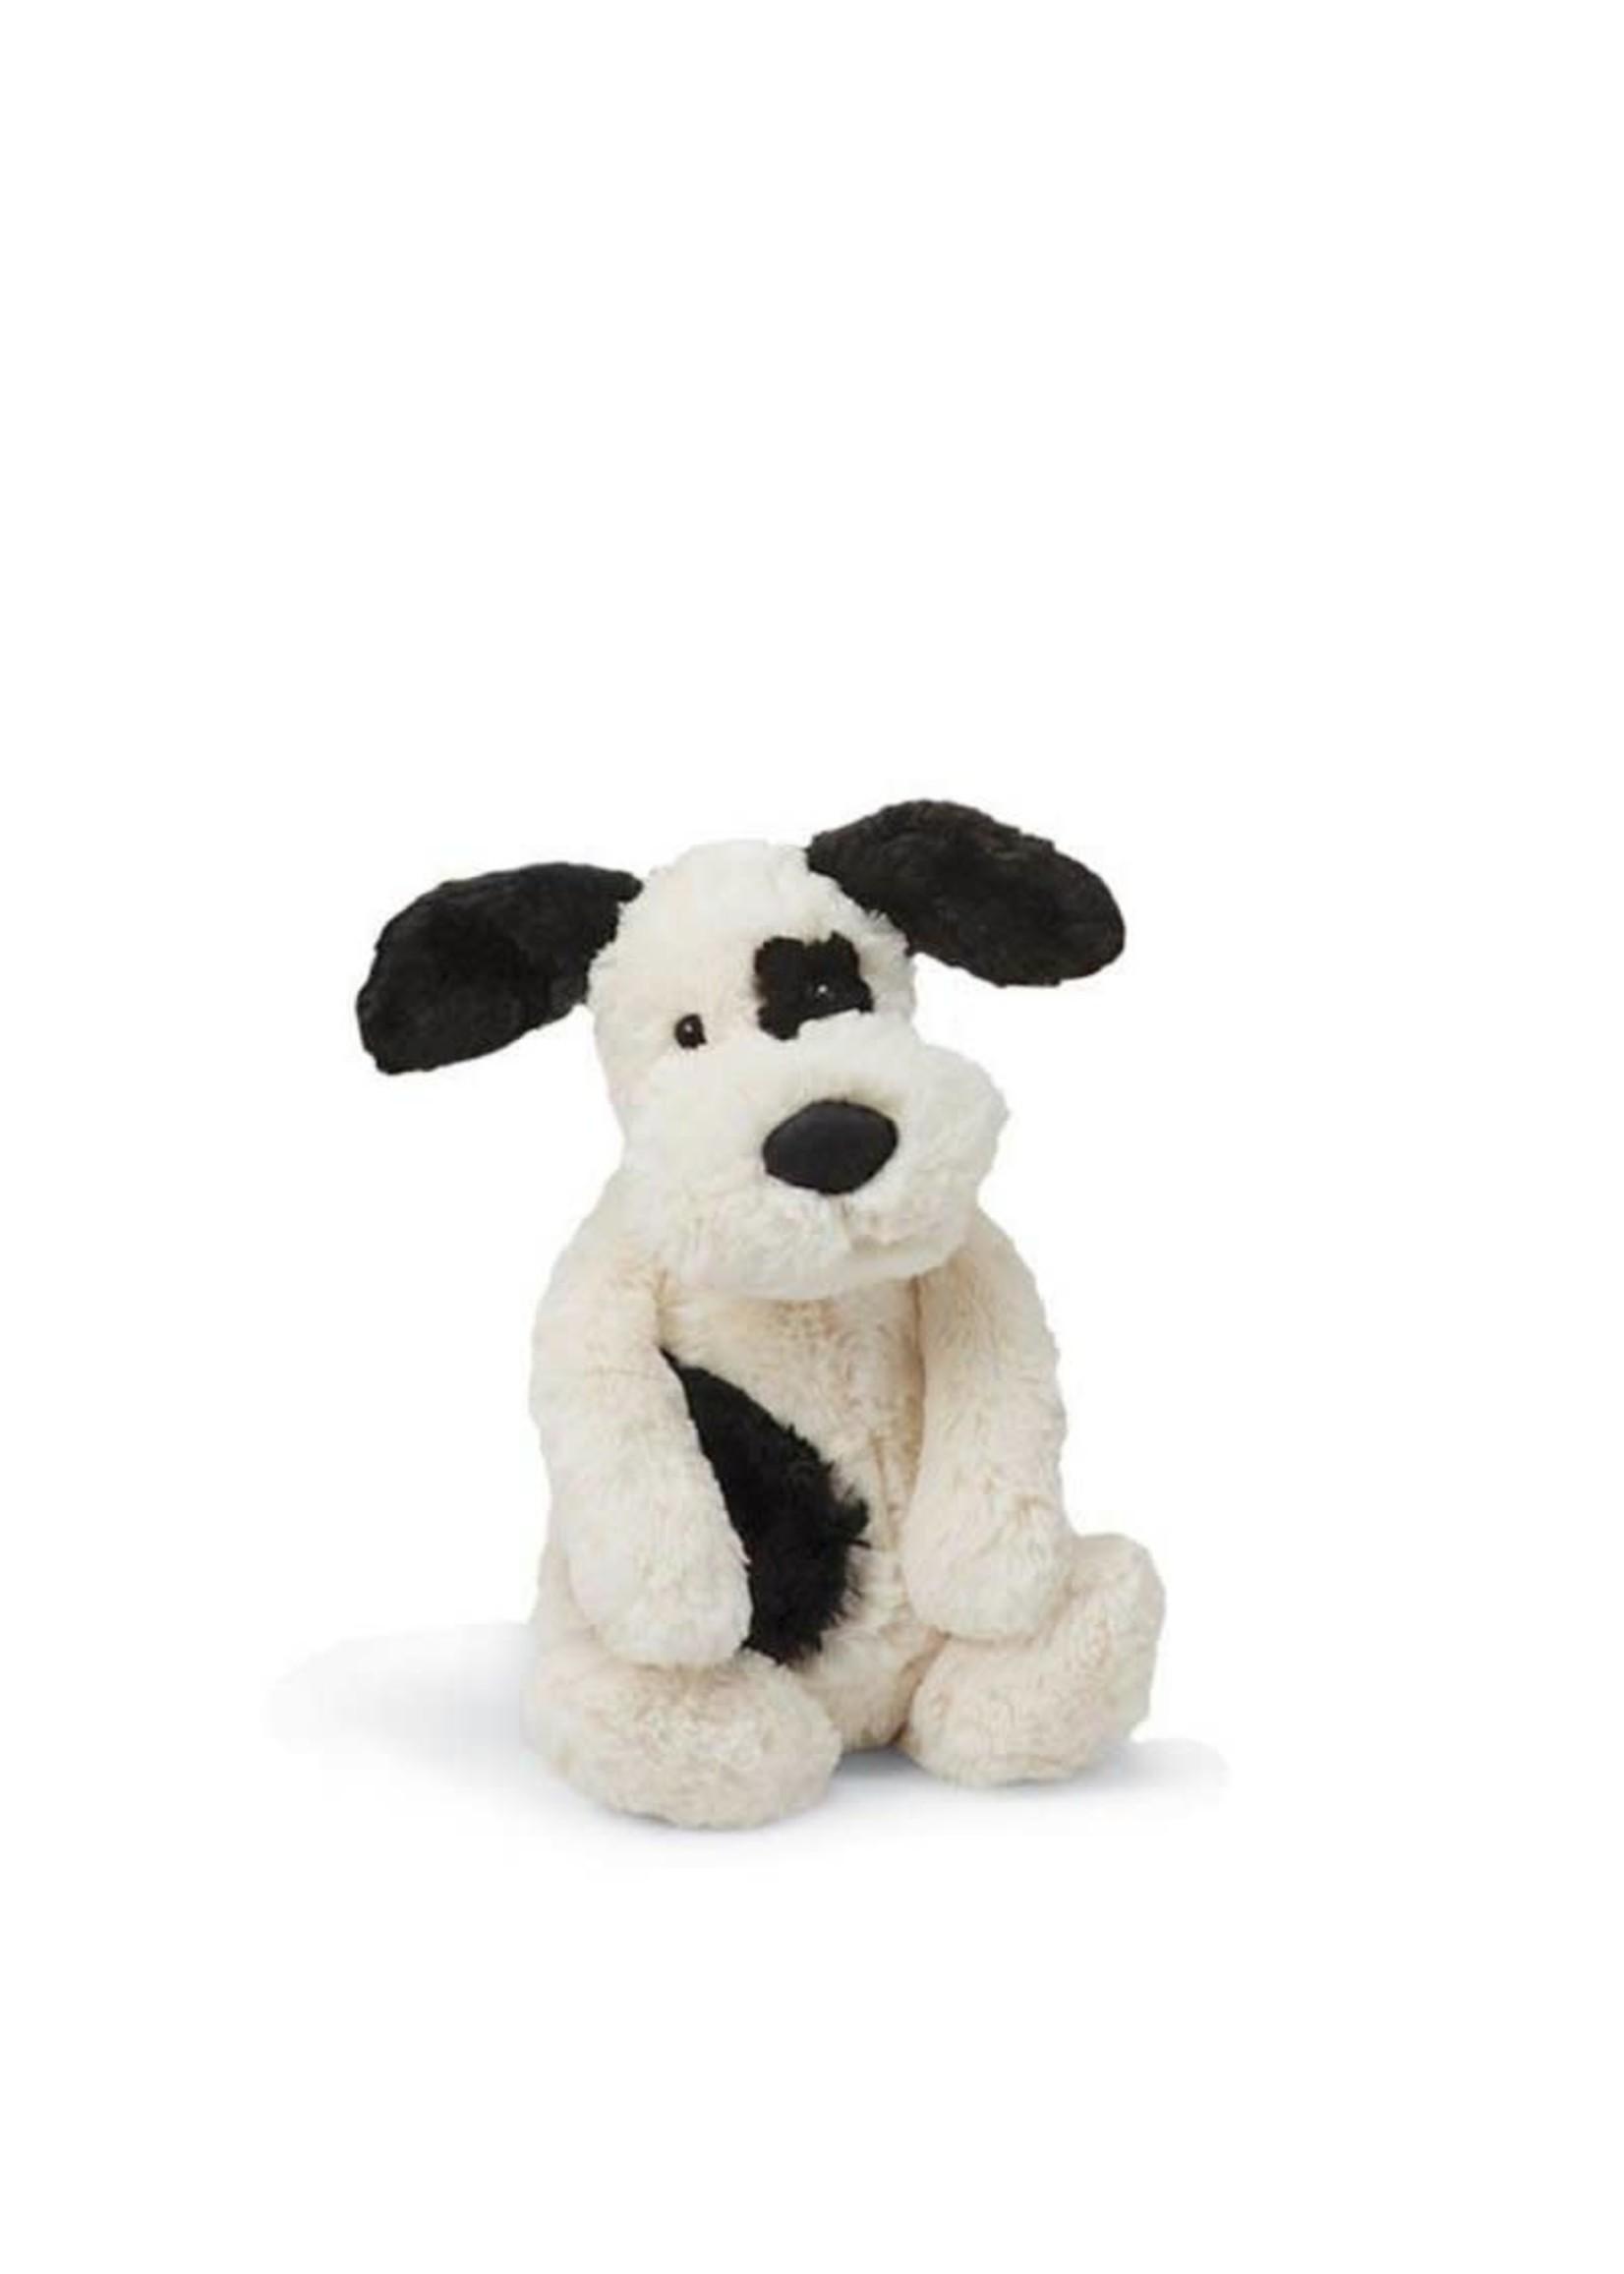 Jellycat JC Small Bashful Black Cream Puppy